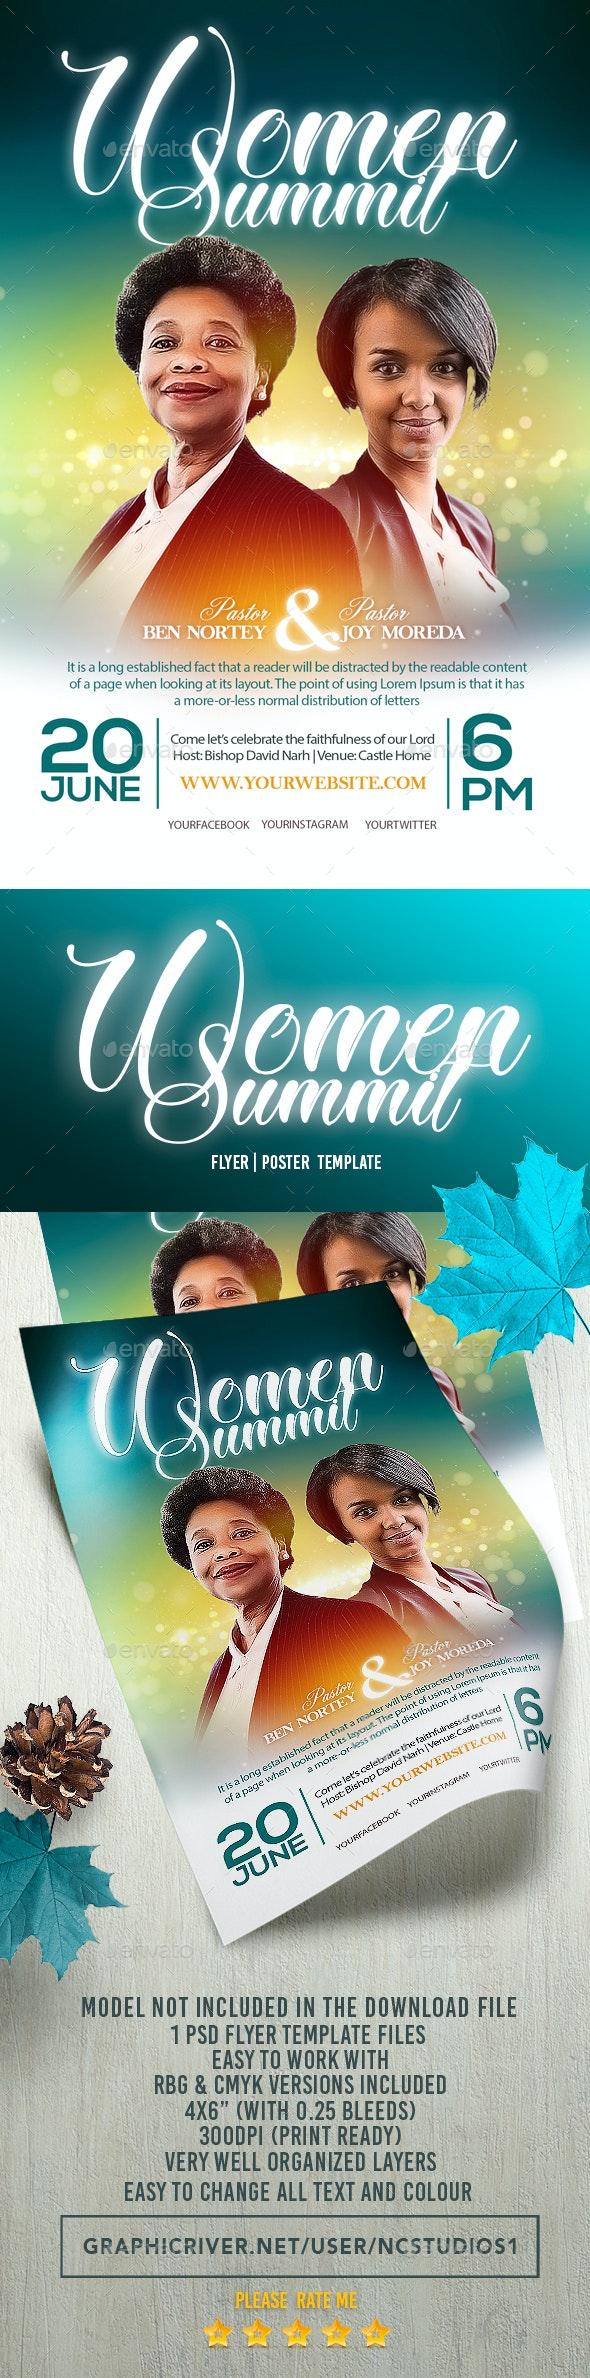 Women Summit Flyer Template - Flyers Print Templates